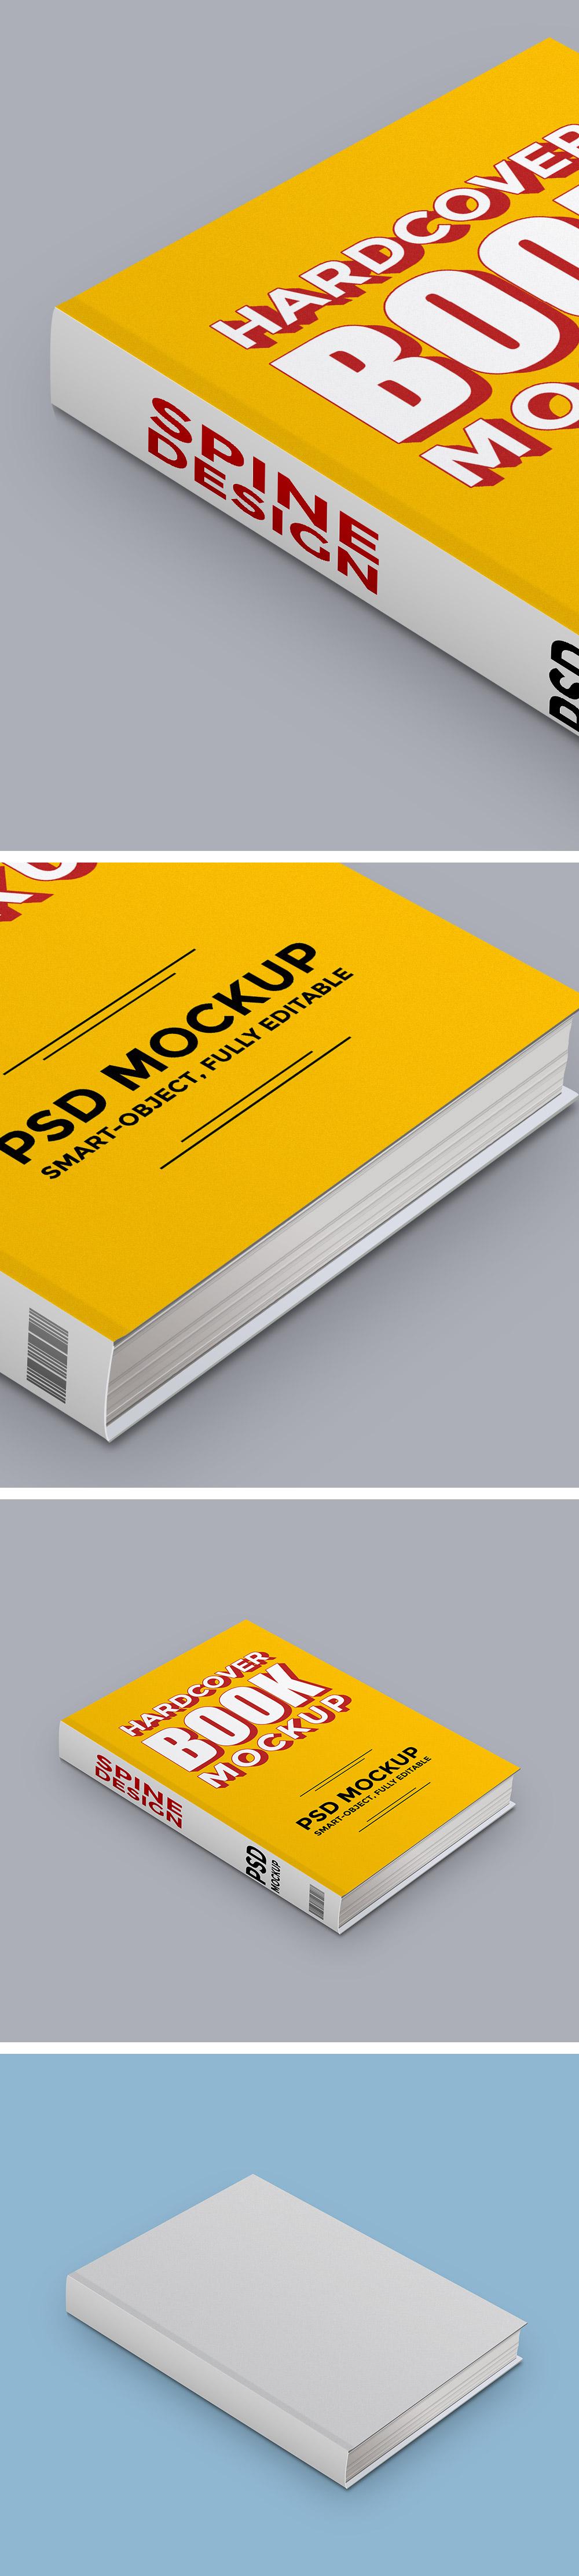 Hardcover Book FREE PSD Mockup